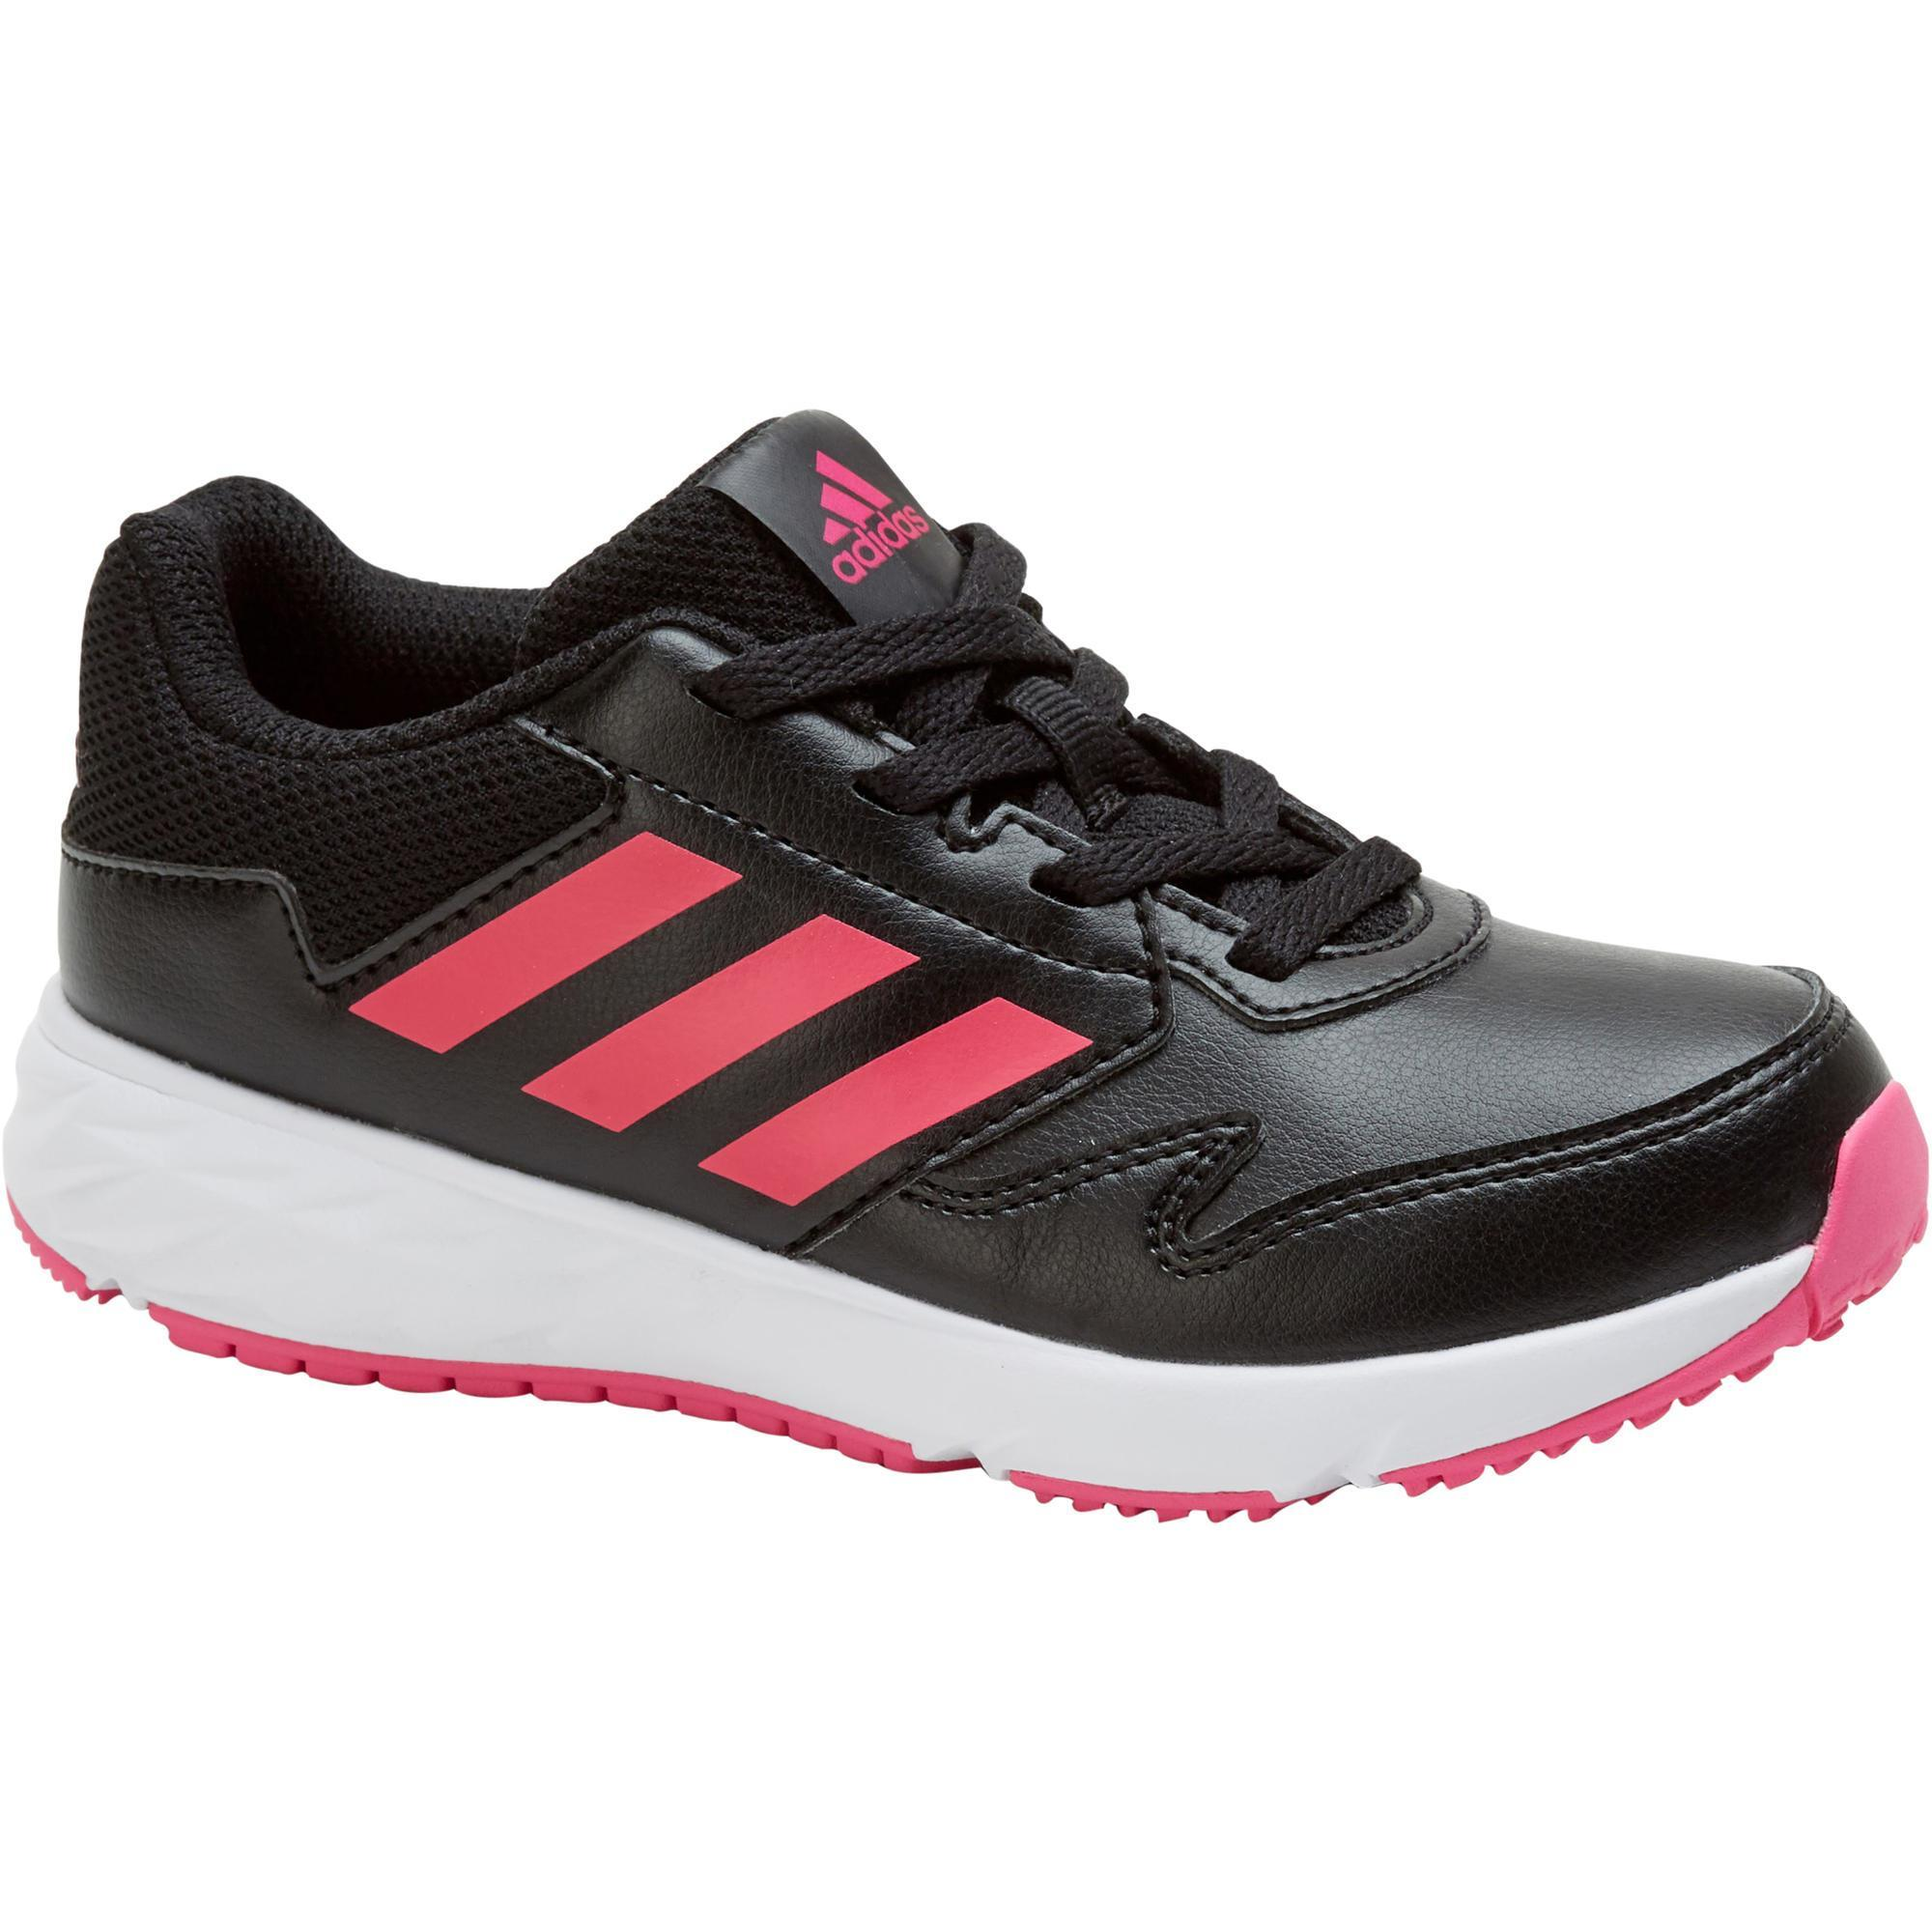 Adidas Kindersneakers Fastwalk veters zwart-roze